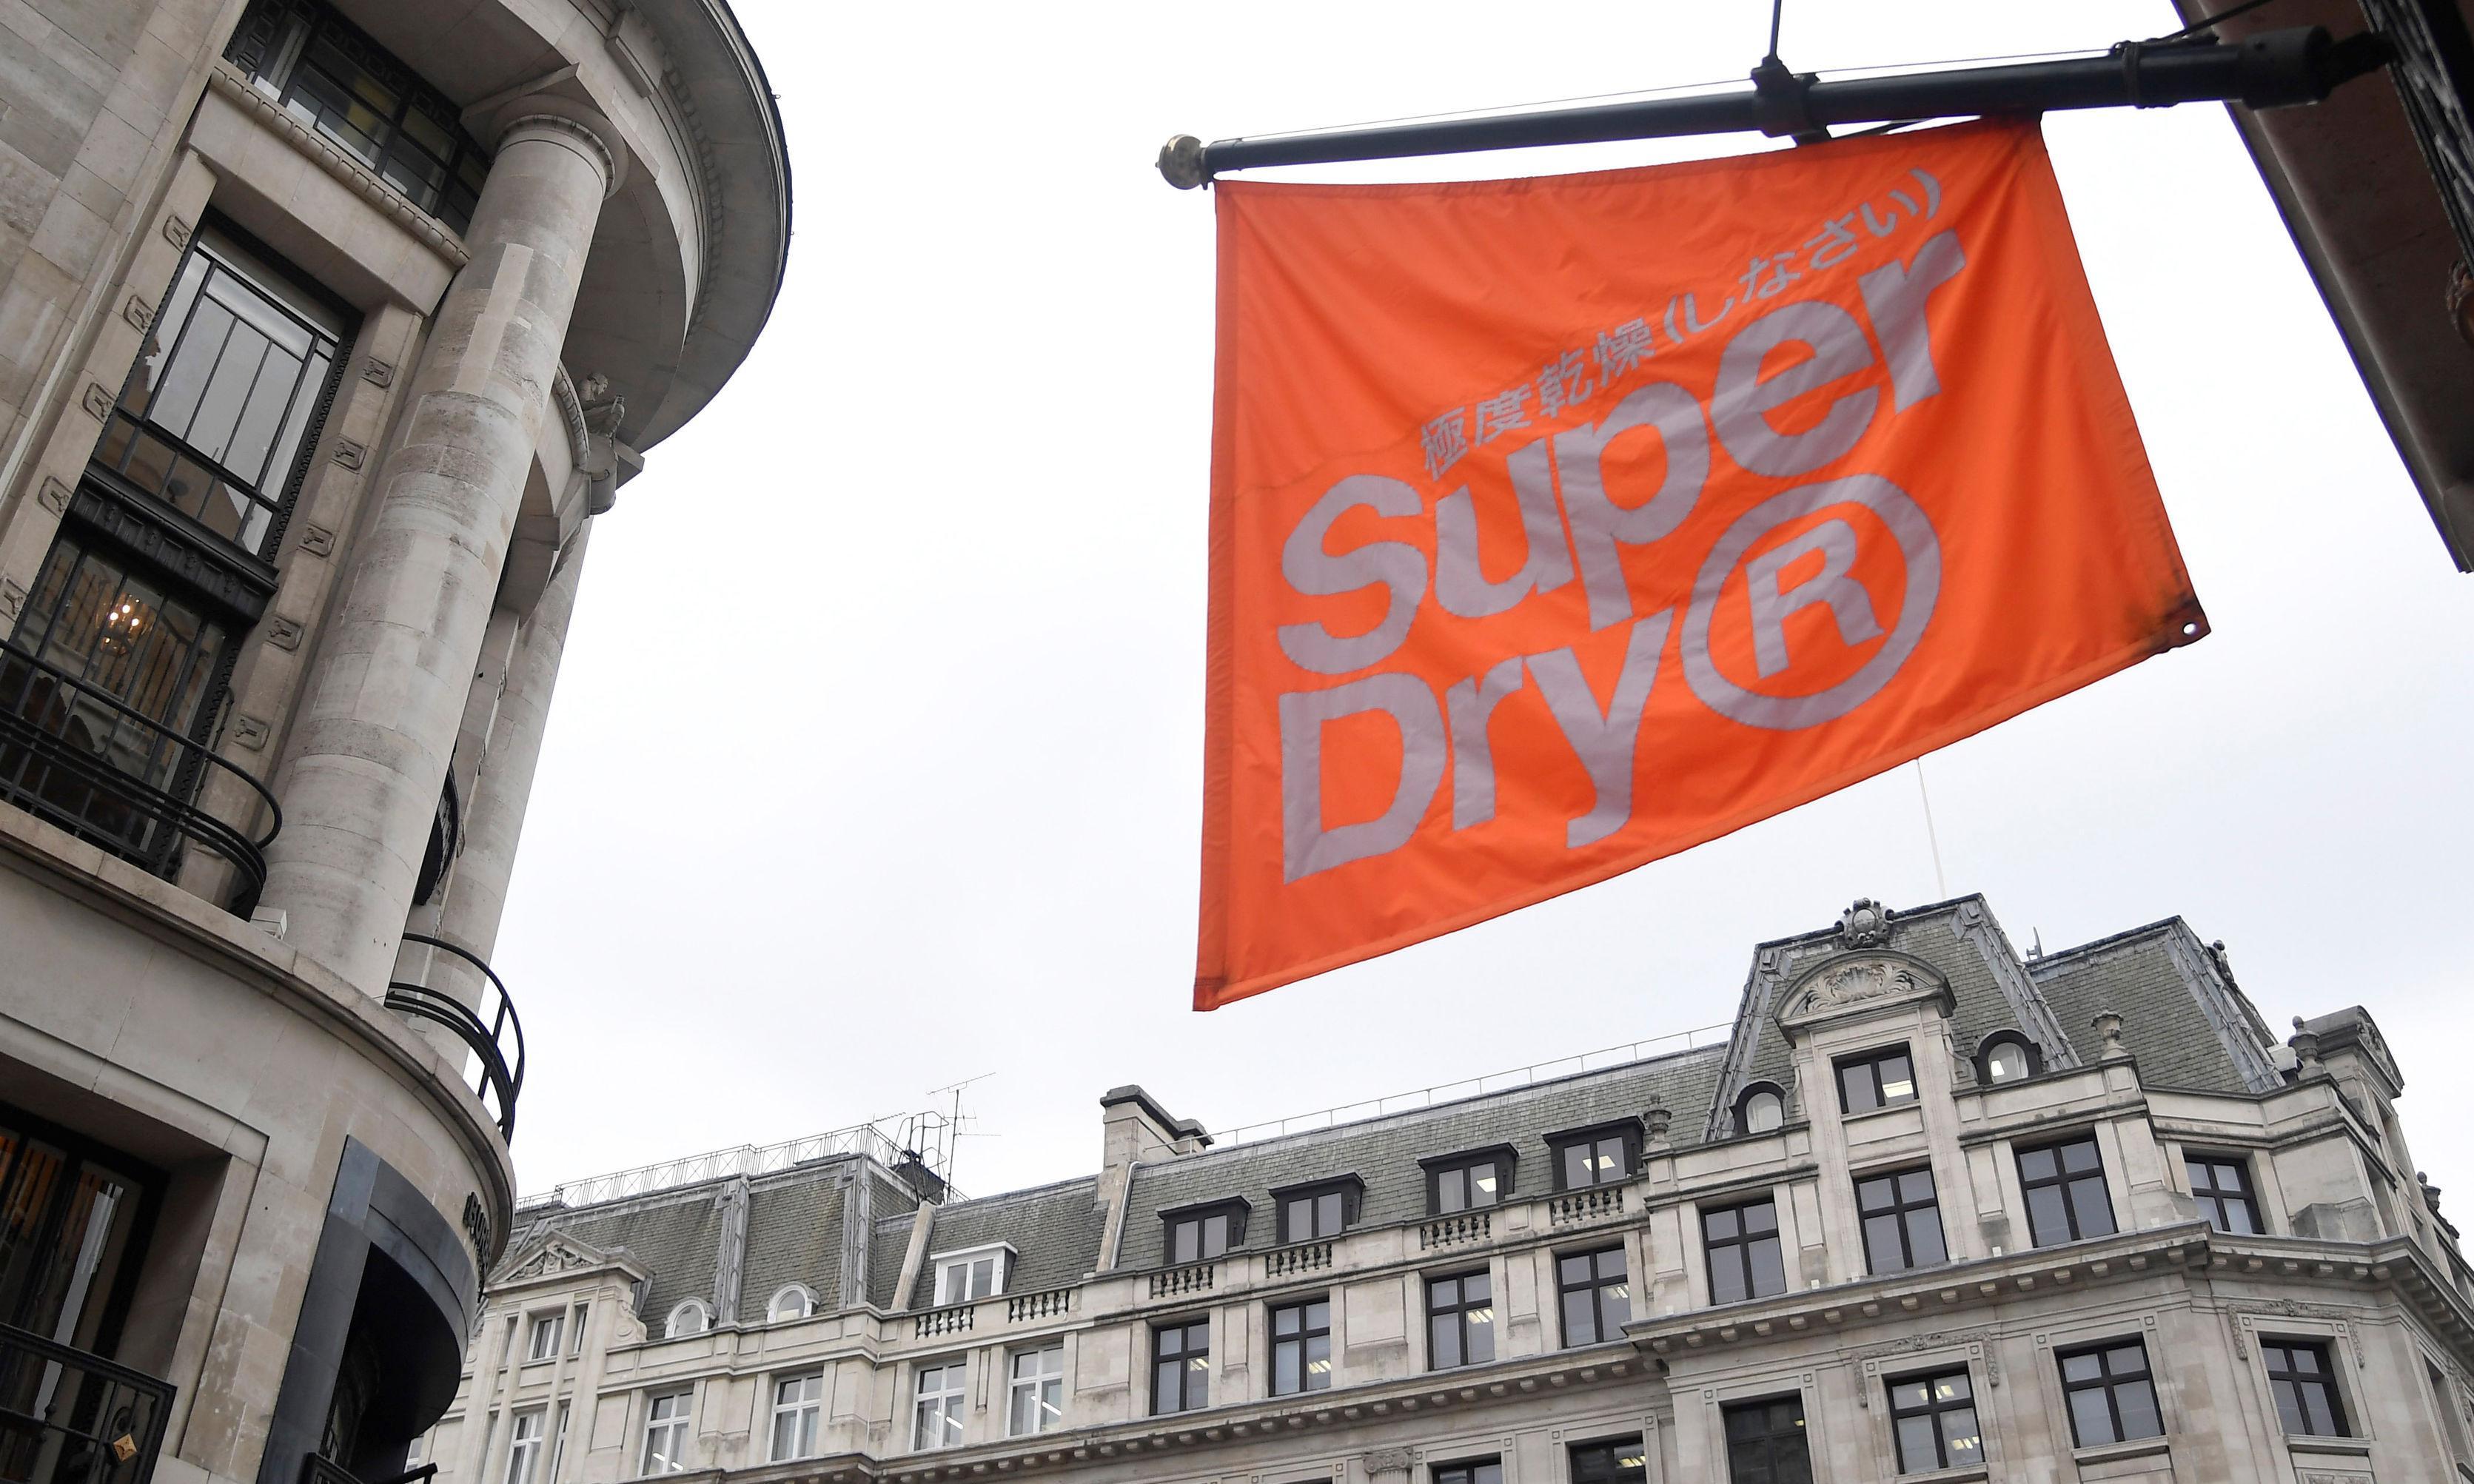 Superdry founder's return dealt blow by shareholder advisers